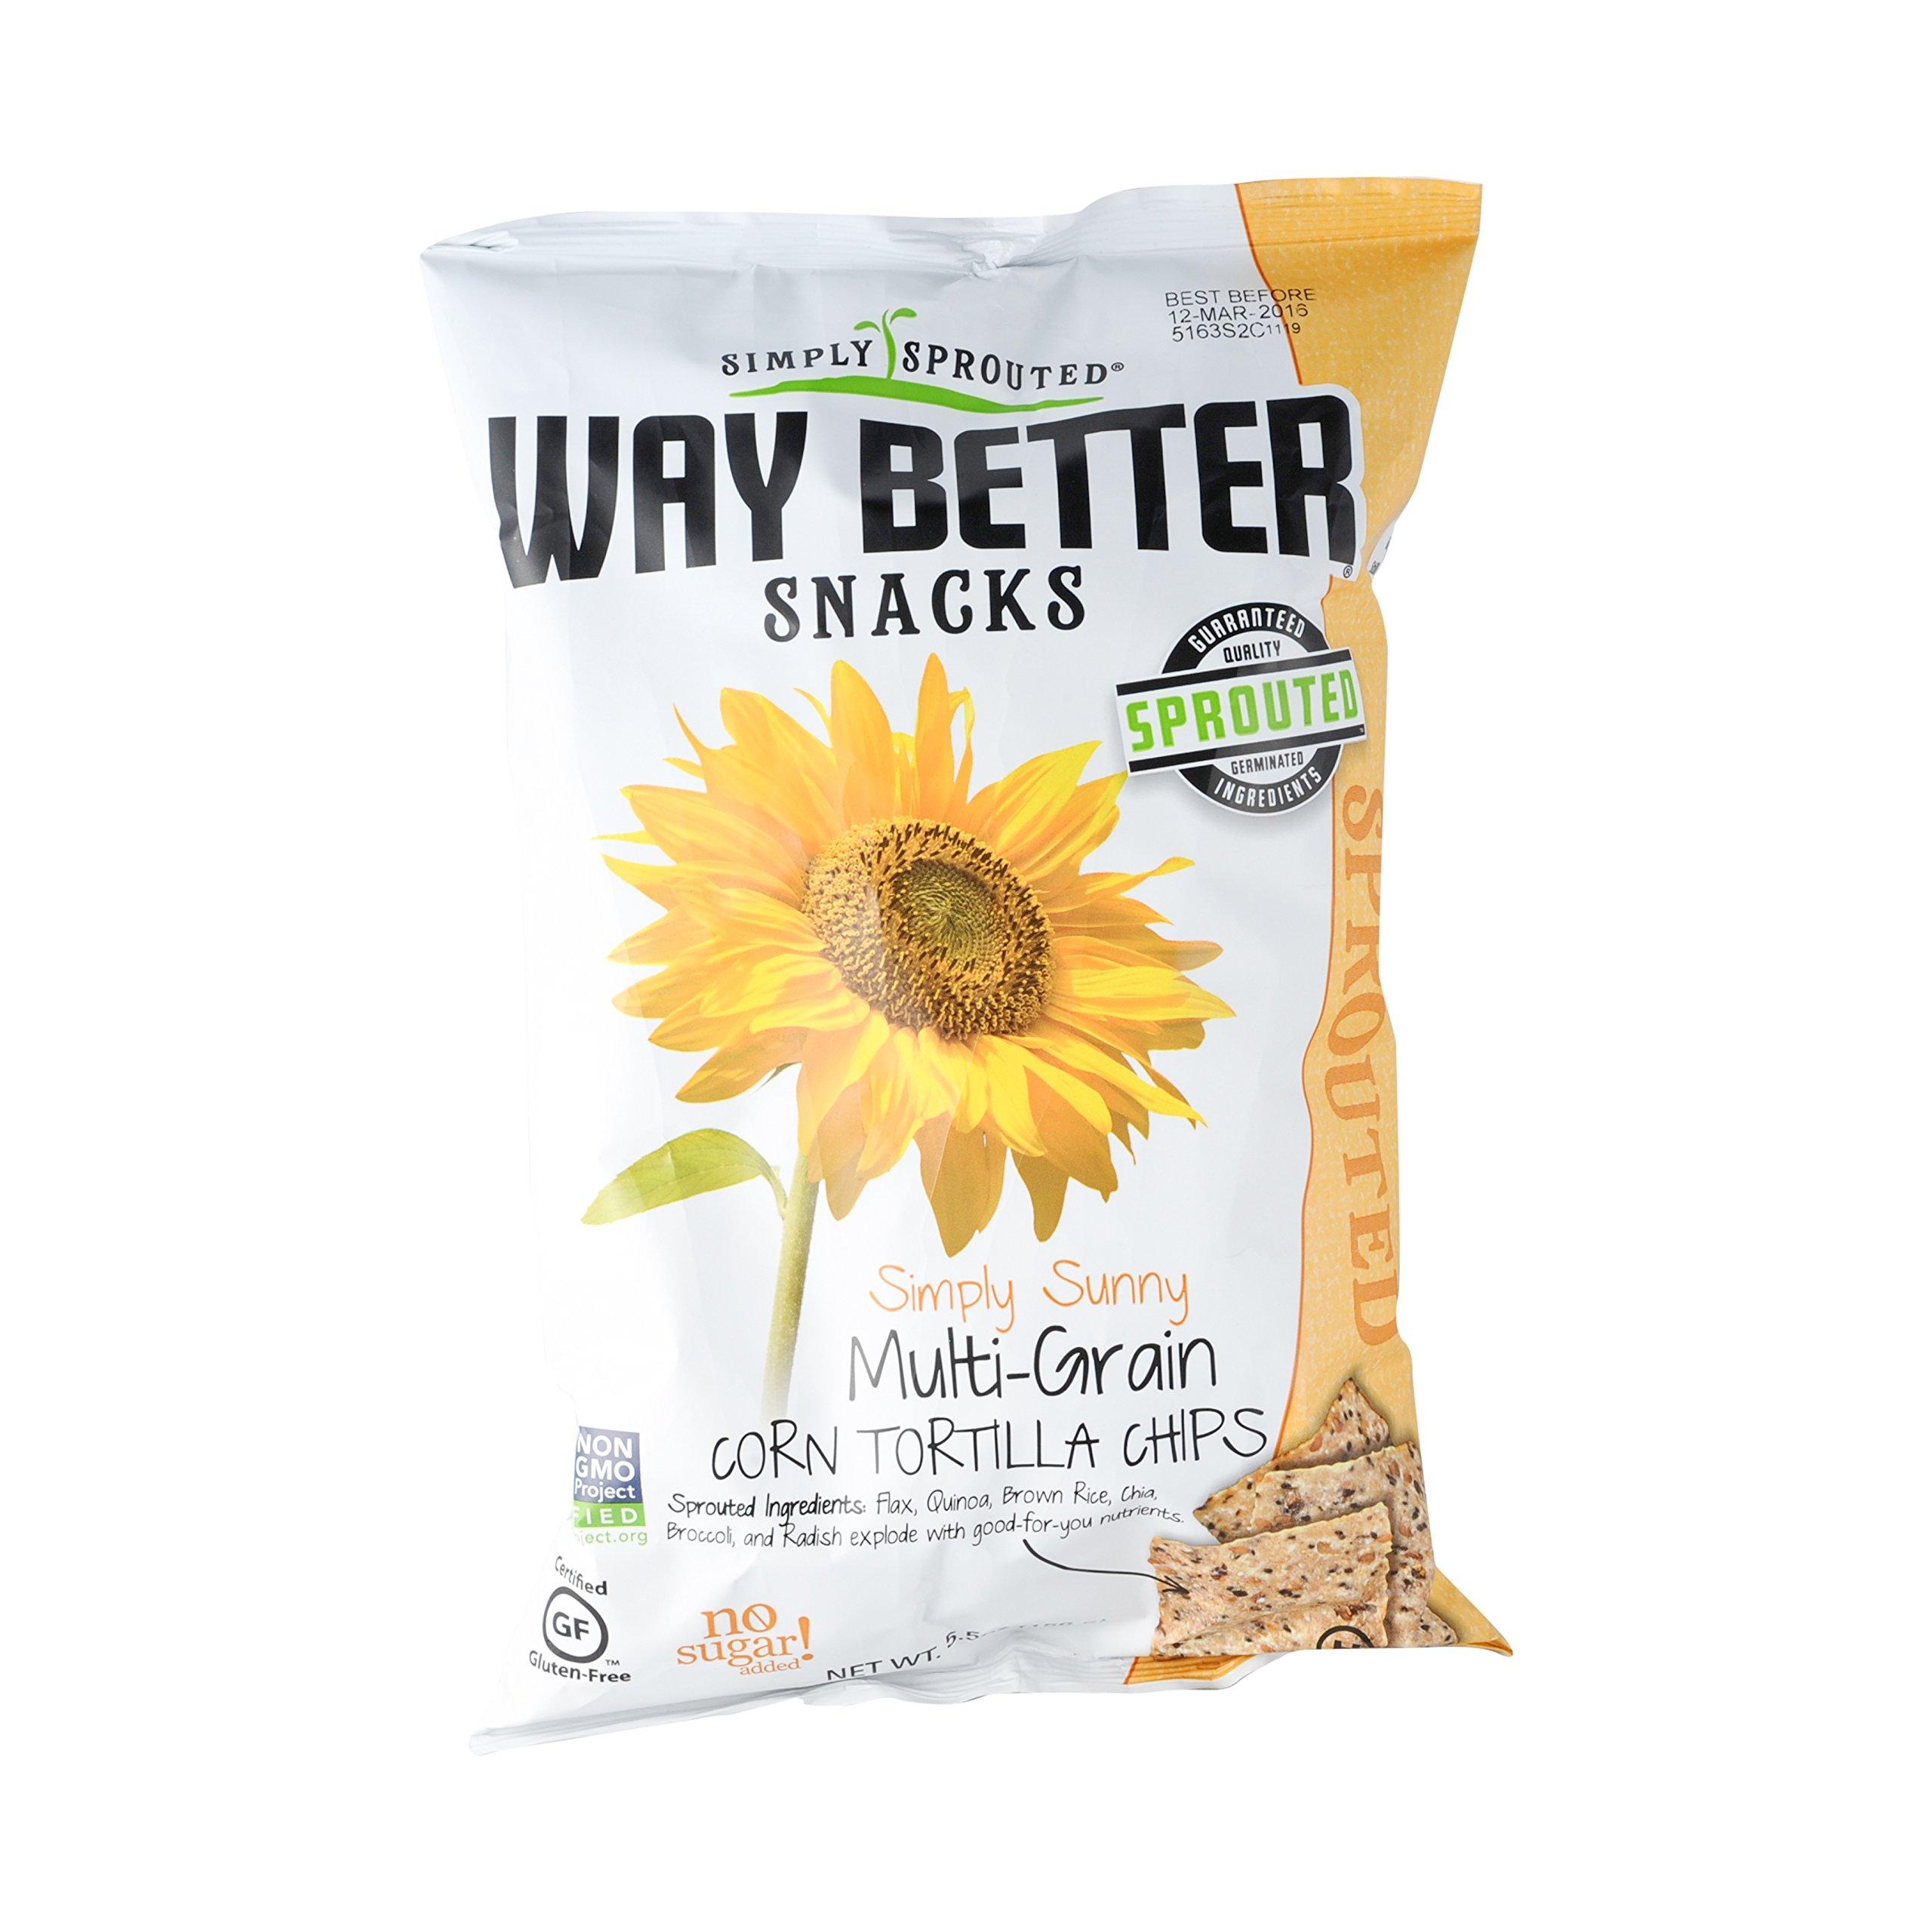 Way Better Snacks Simply Sunng Multigrain Tortilla Chips, 5.5 oz bag (12 Pack) (